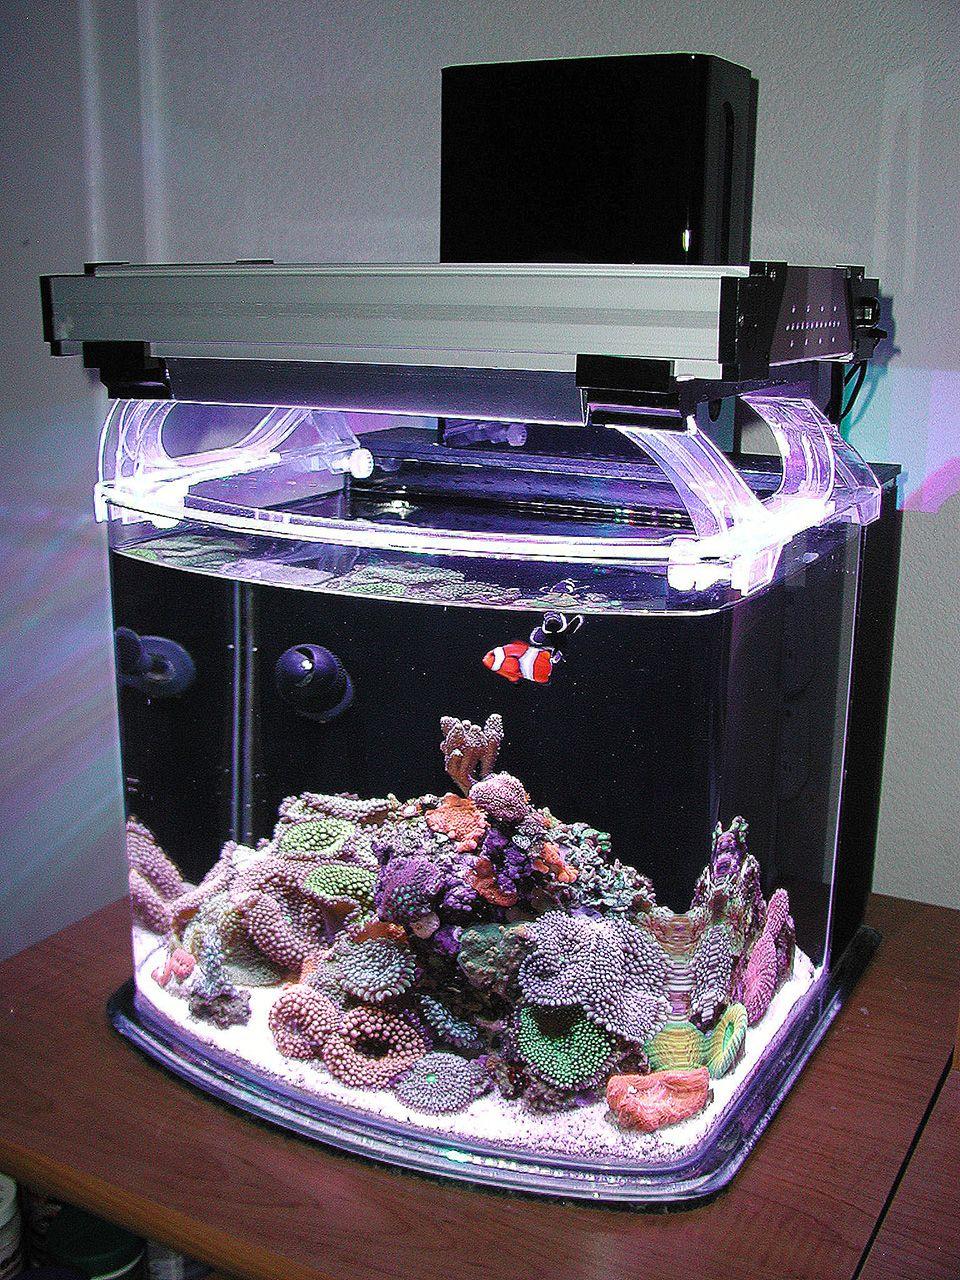 Nano Sapiens 2013 Featured Nano Reefs Featured Aquariums Monthly Featured Nano Reef Aquarium Profil Saltwater Fish Tanks Reef Aquarium Aquarium Fish Tank